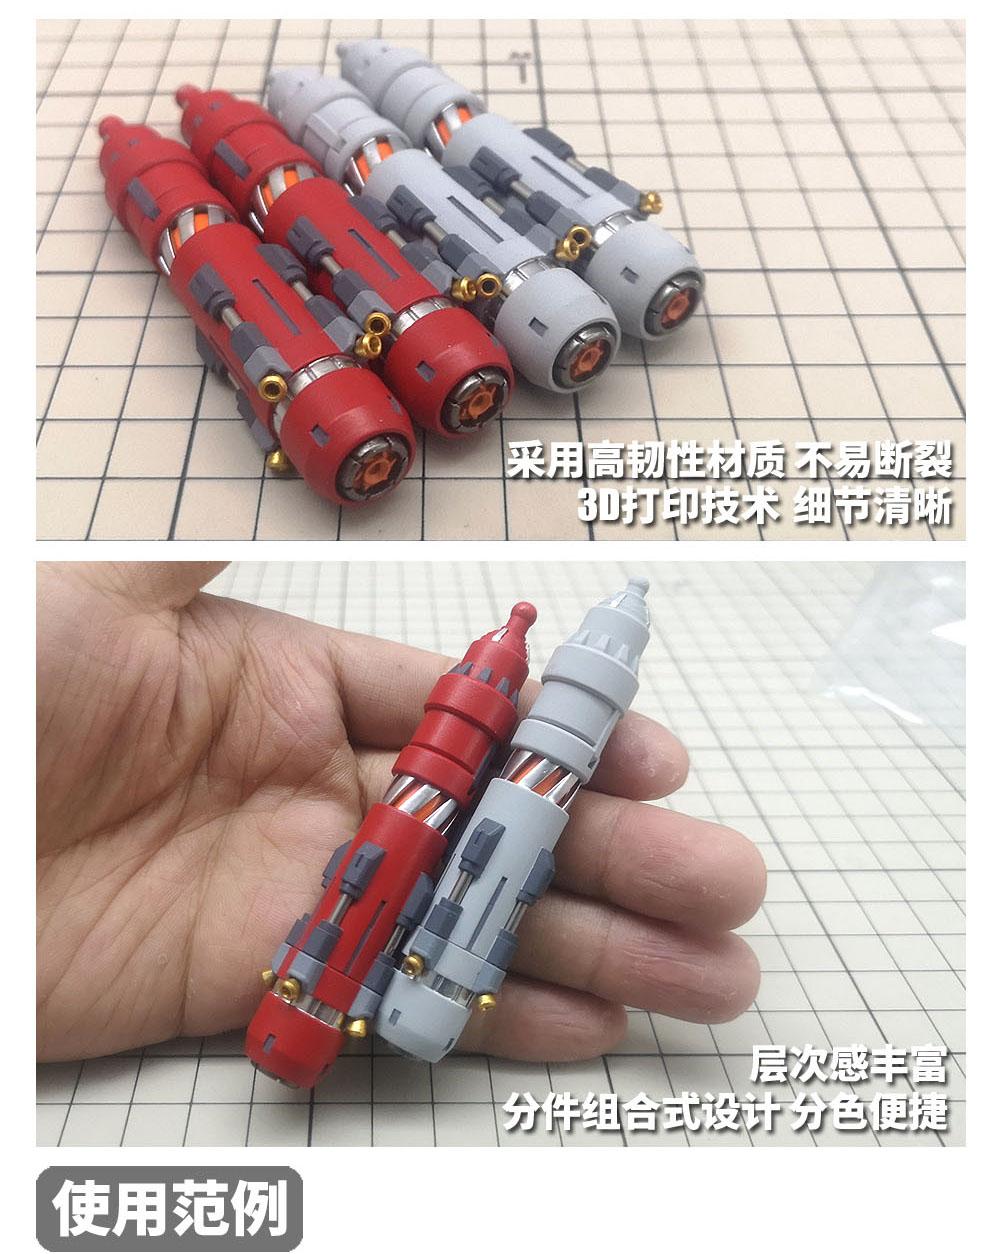 G829_HS018RG_Propeller_tank_006.jpg